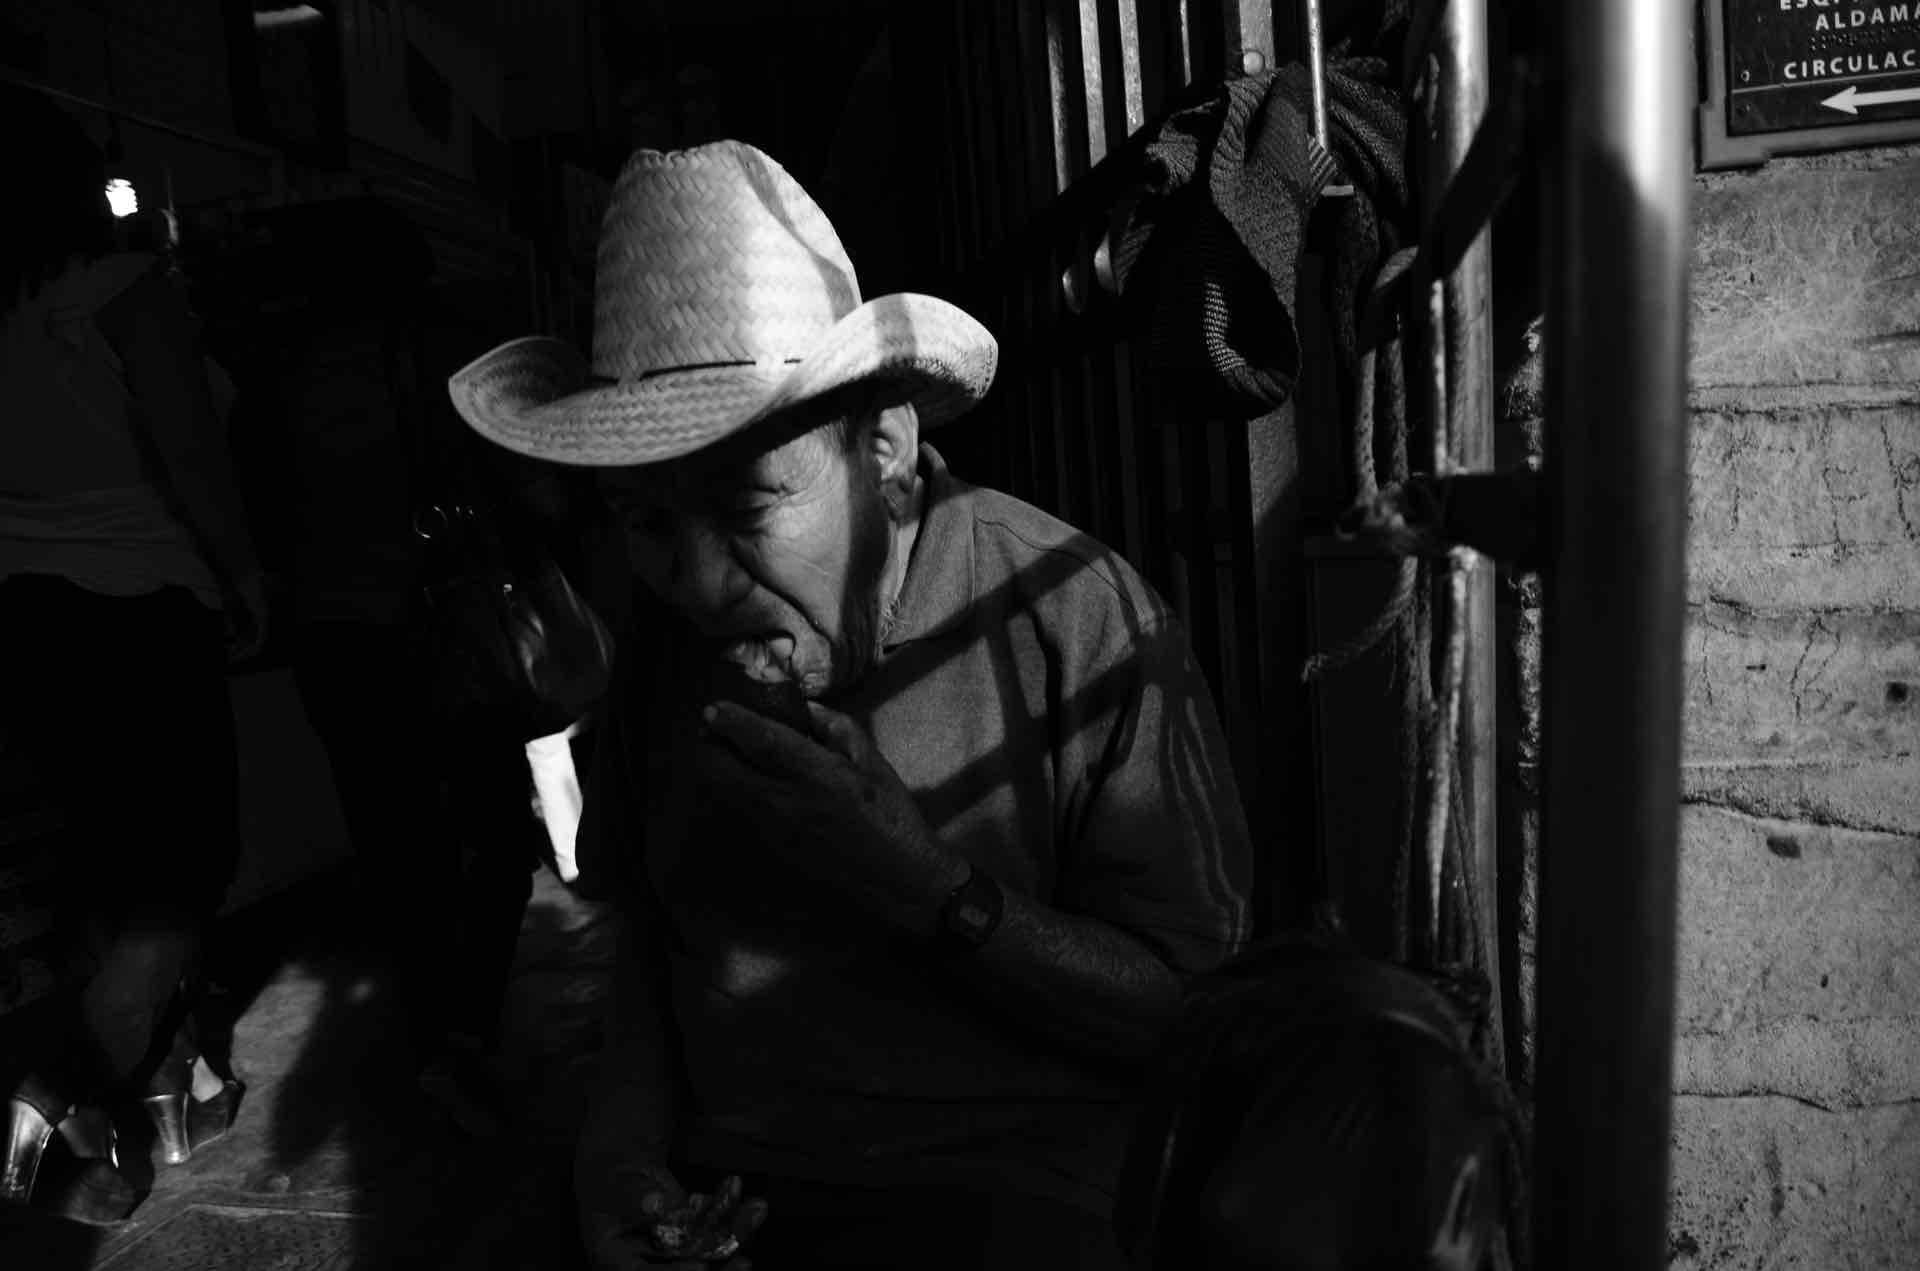 Obra: Oaxaca y la APPO